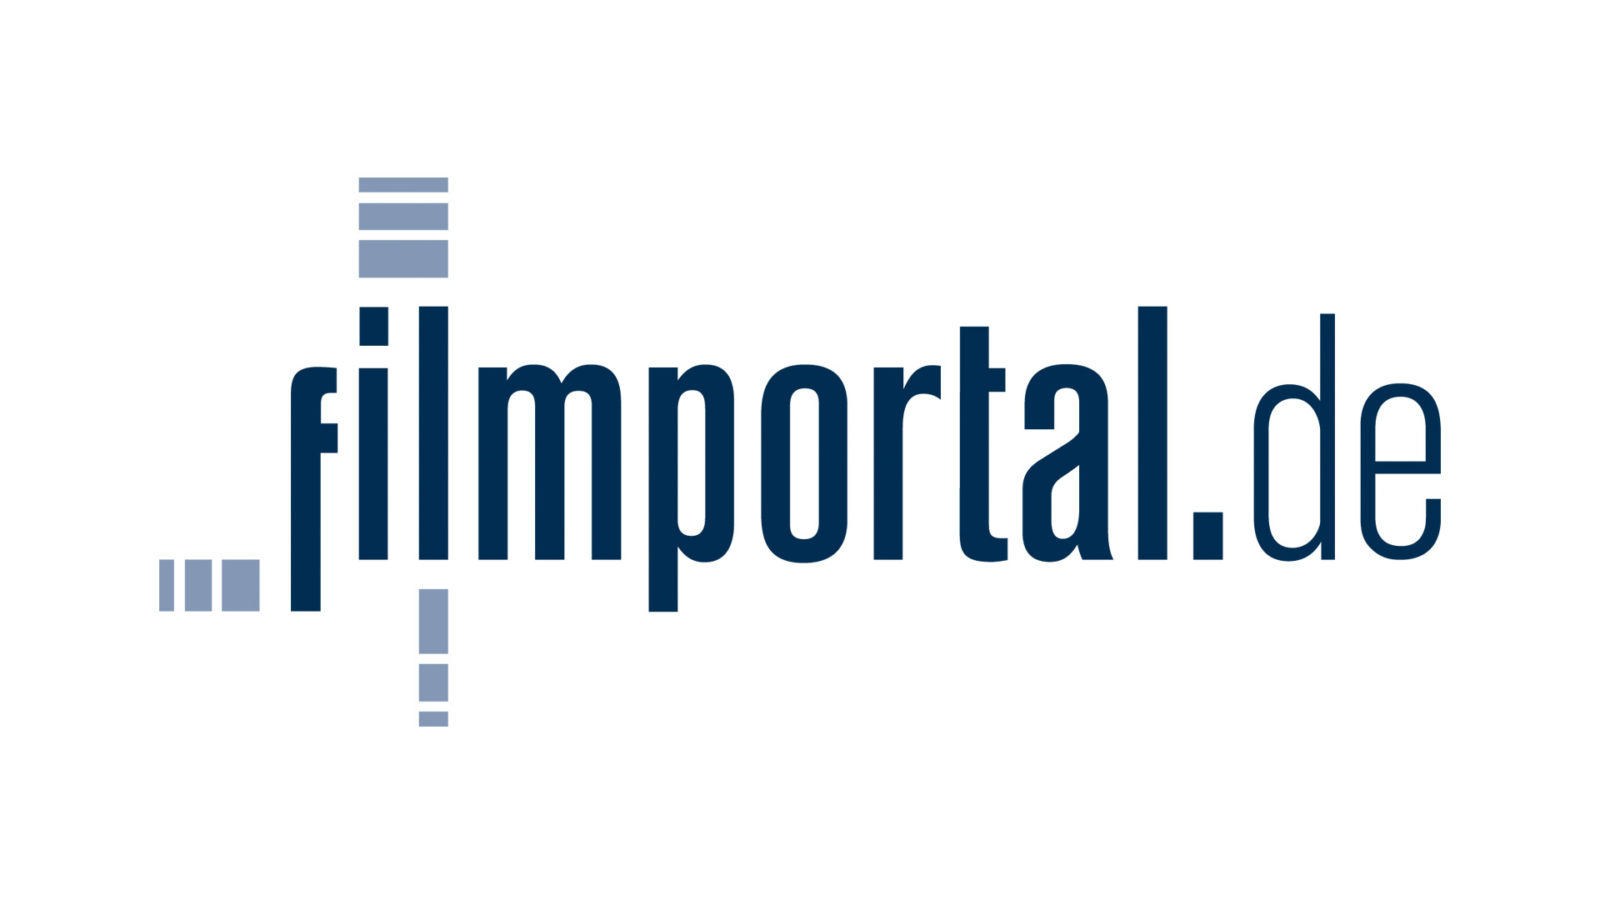 filmportal